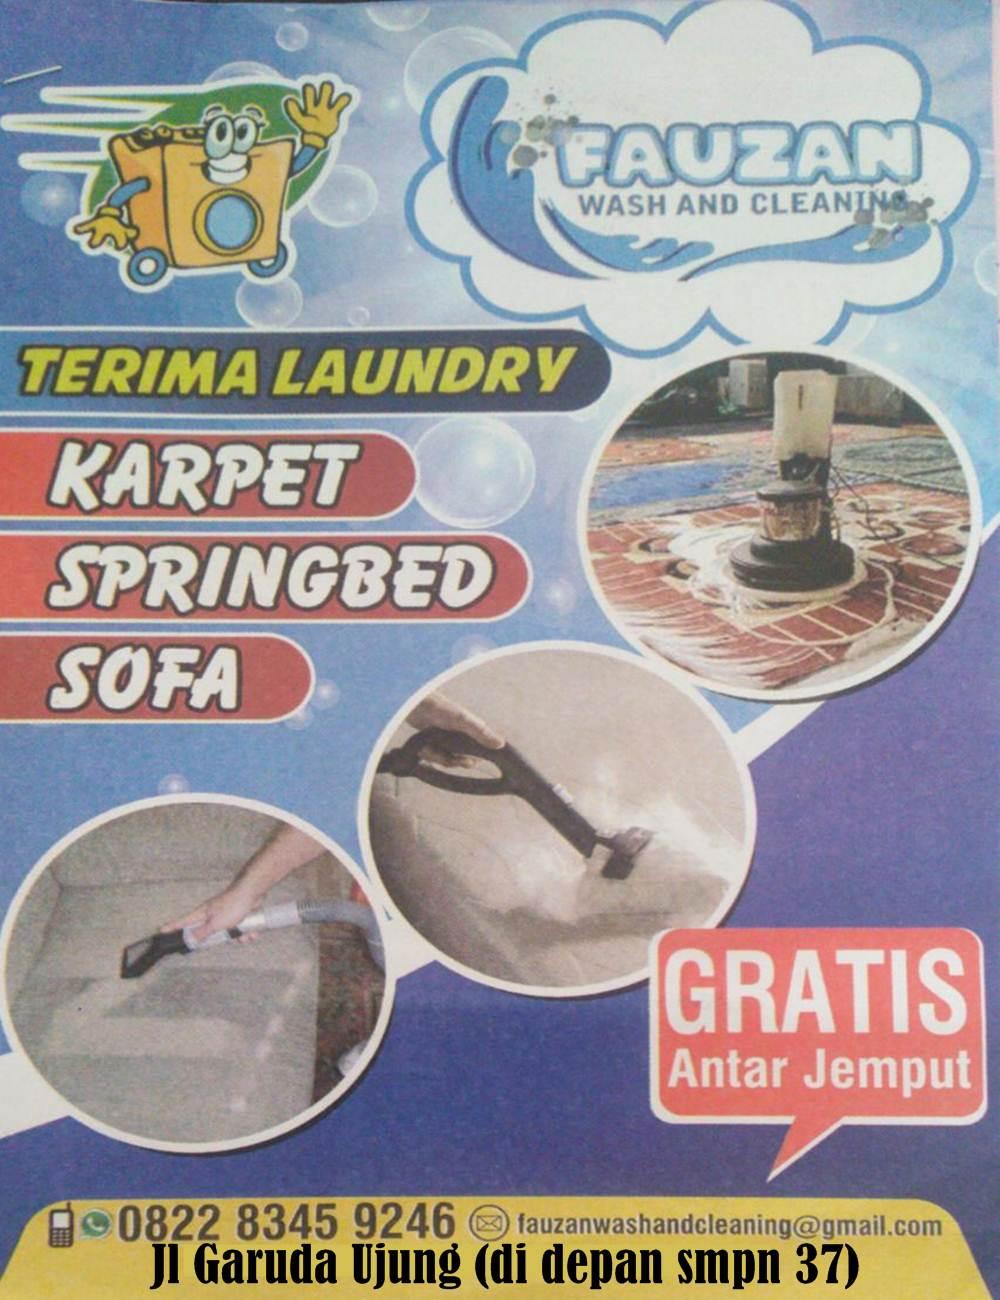 Fauzan Wash and Cleaninc 3 - Fauzan Wash and Cleaninc - Spesialis Laundry Karpet Springbed Sofa Pekanbaru